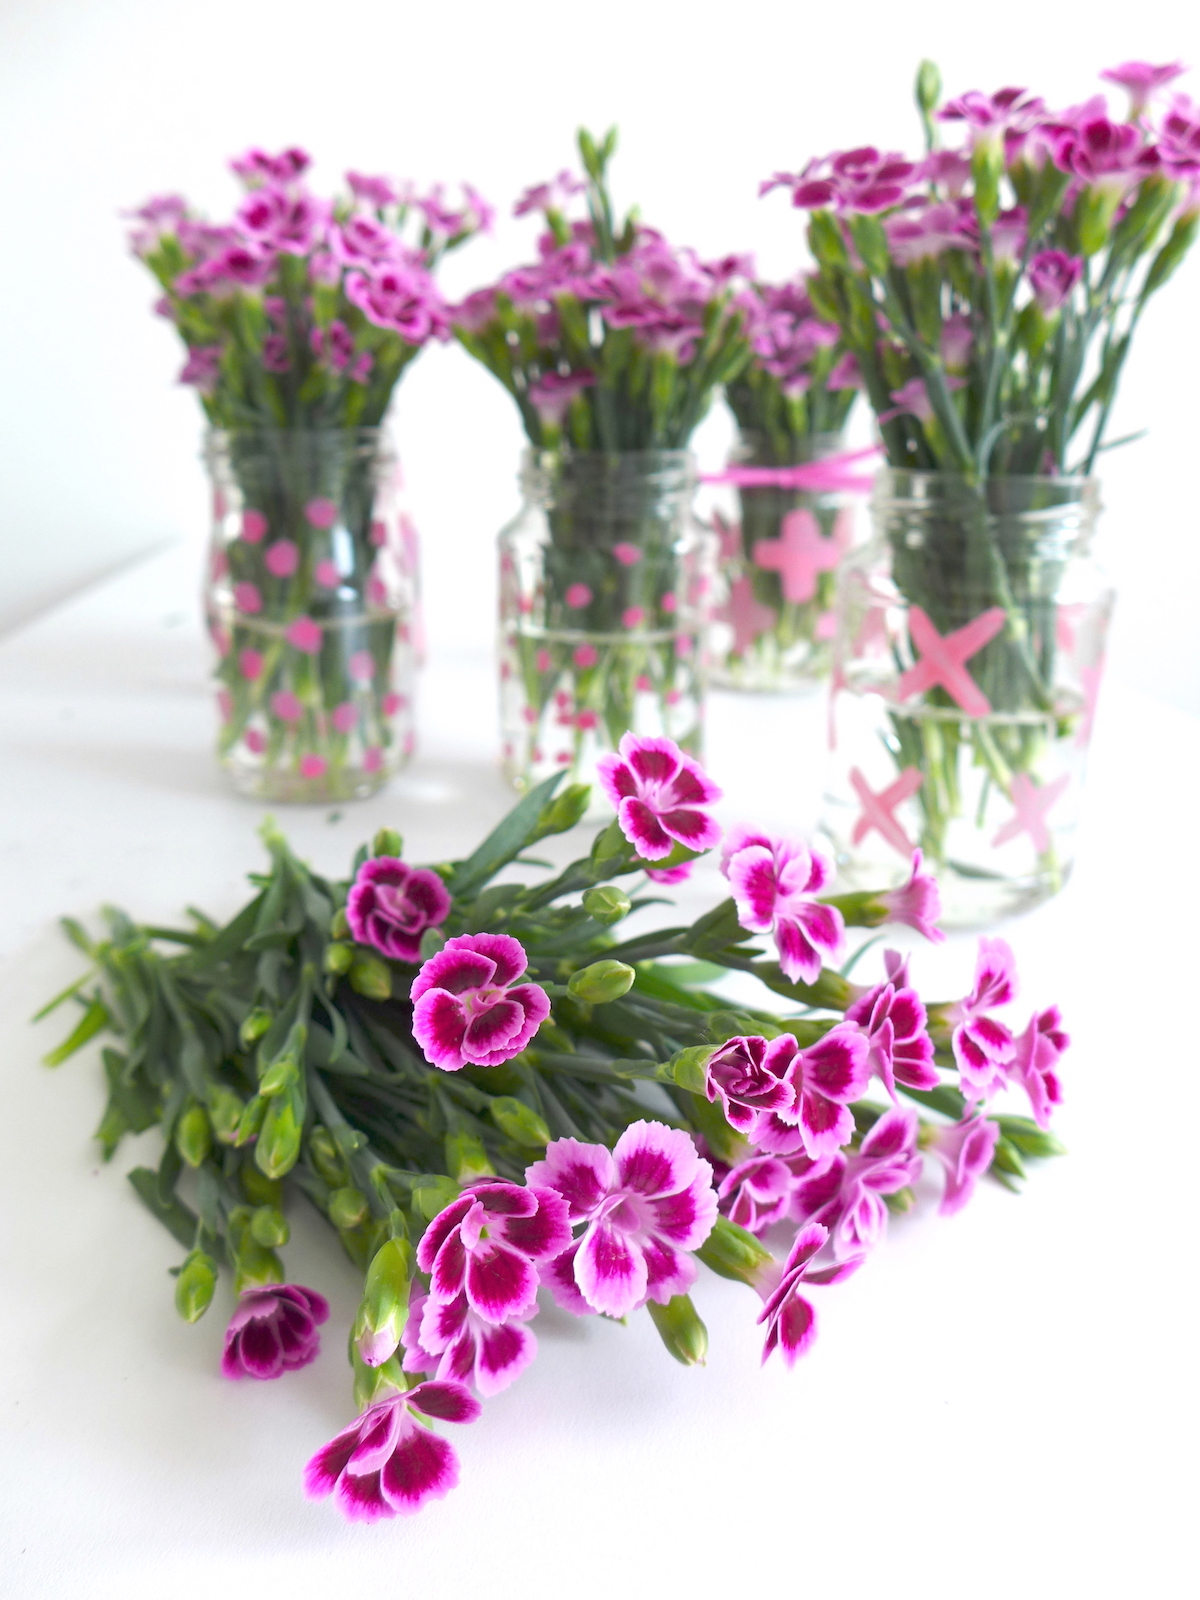 Pinke Nelken in DIY Vasen sophiagaleria